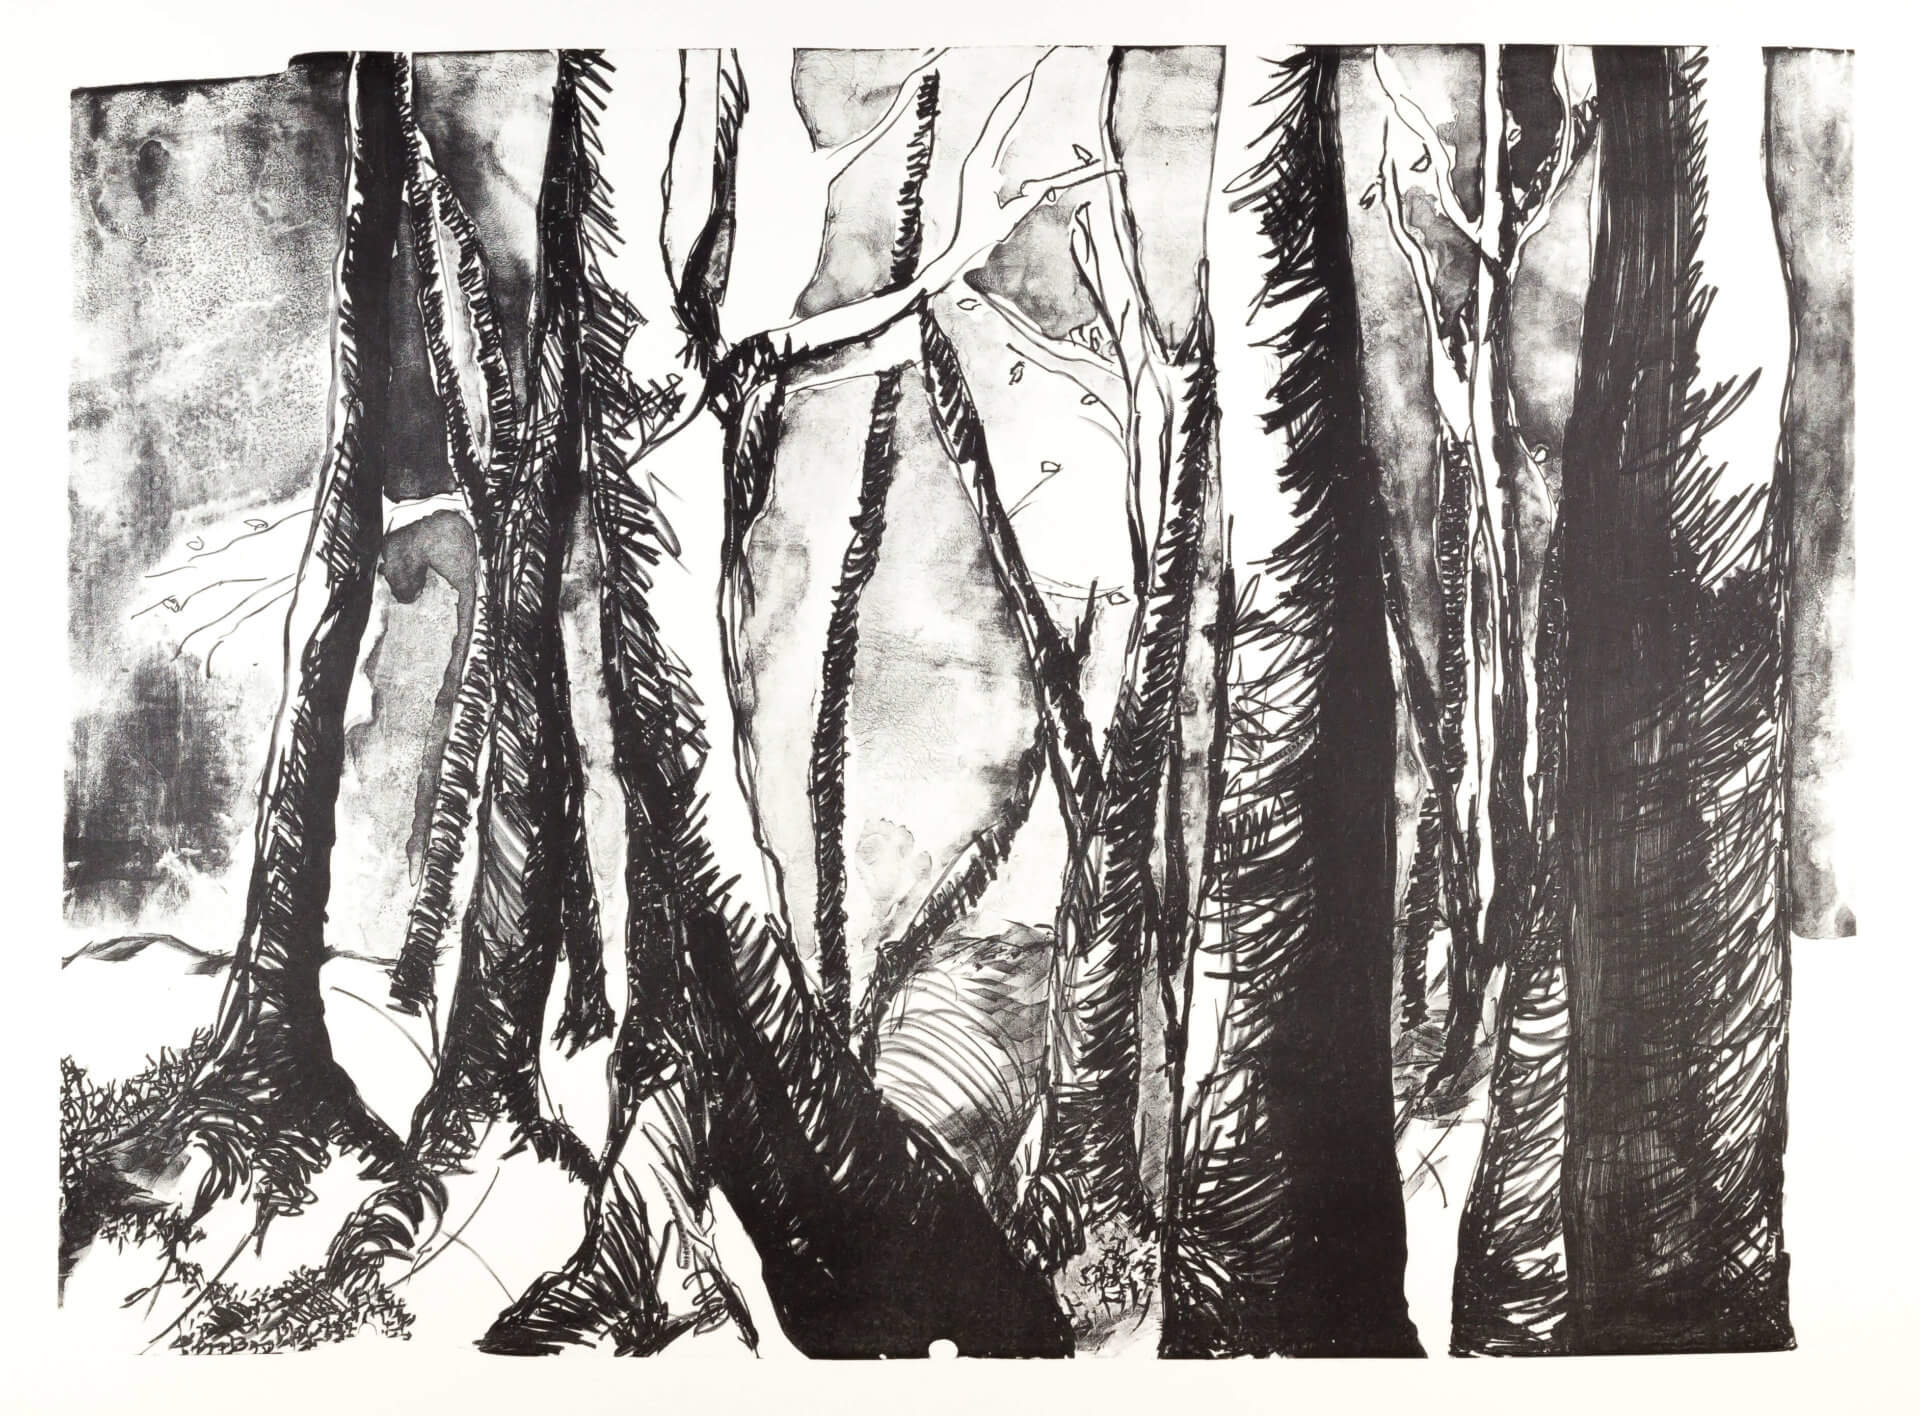 Katharina Albers, Wald (D), 2015, Lithographie (8 Steine), Unikat, 70×100 cm